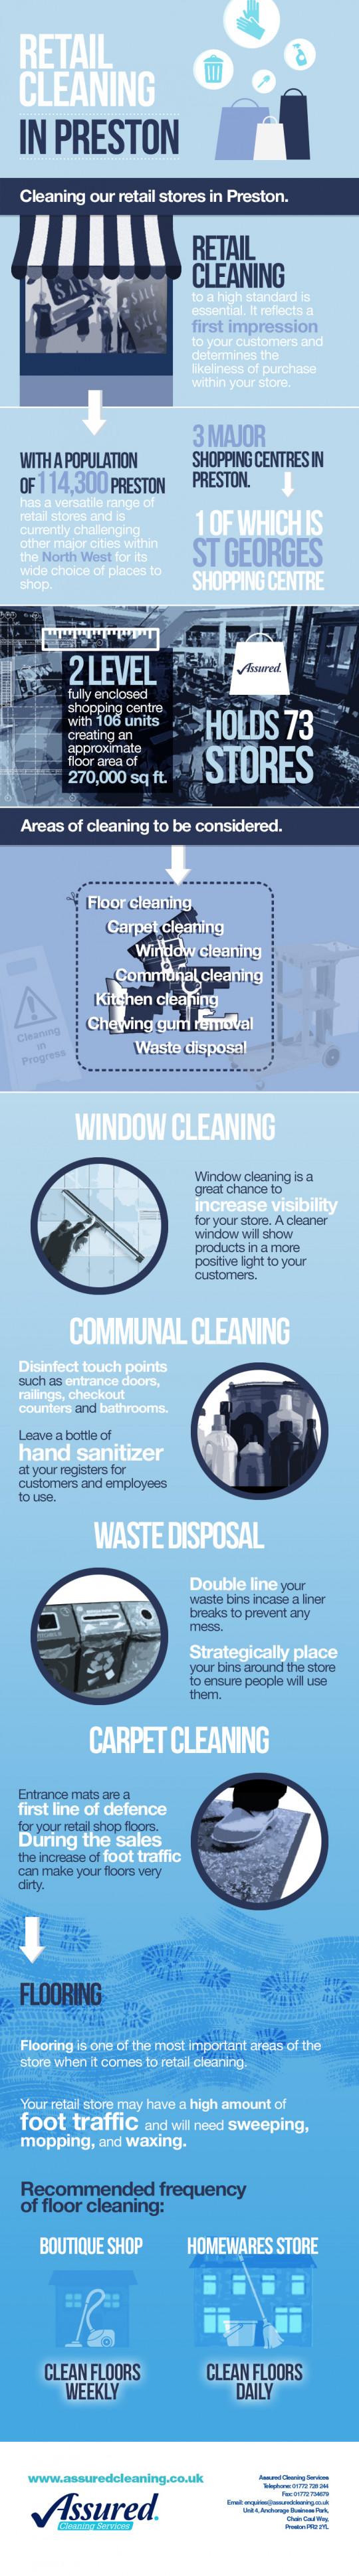 Retail Cleaning in Preston